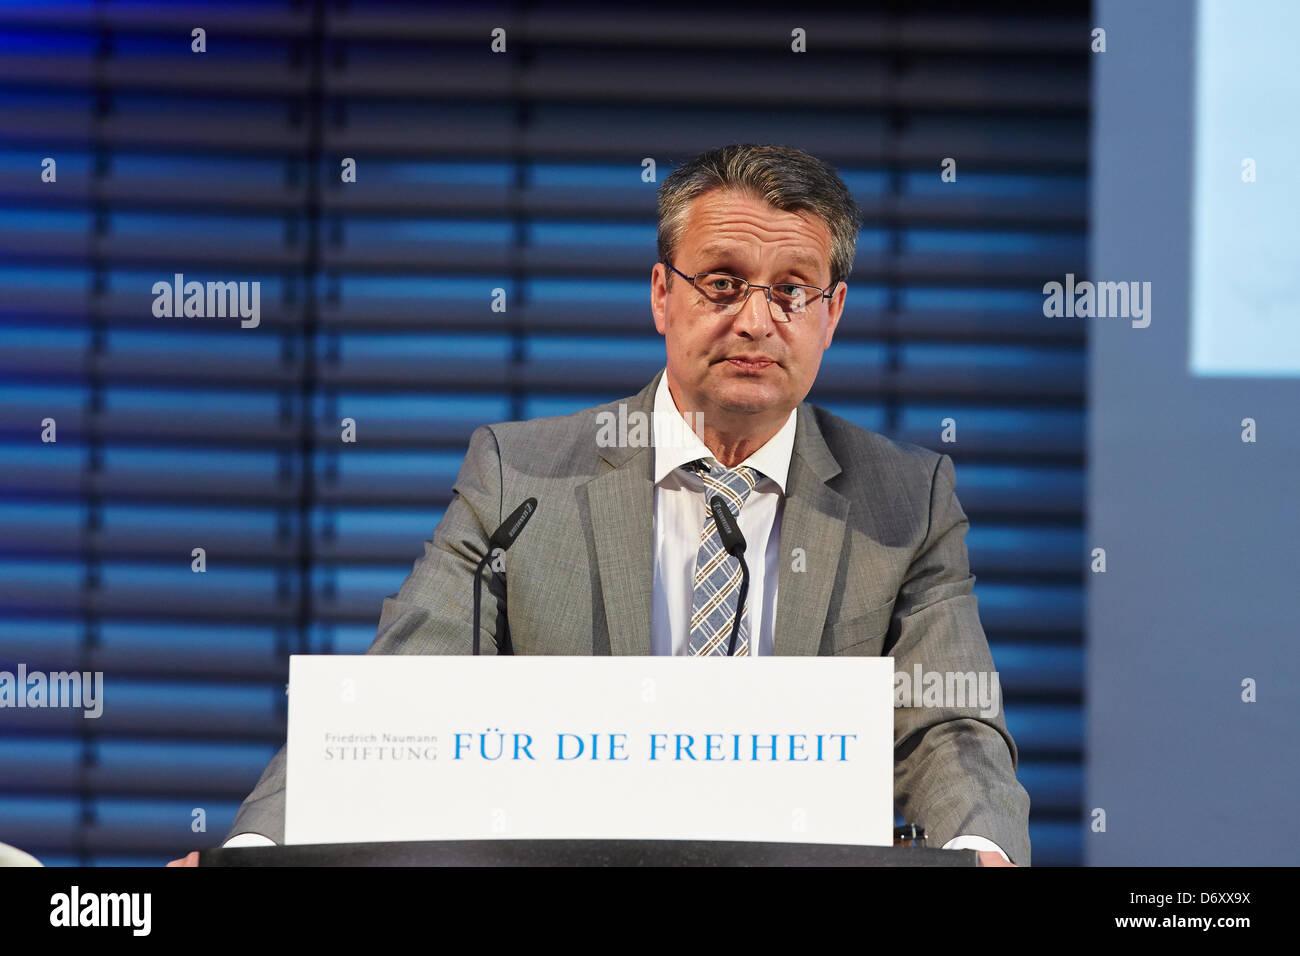 Berlin, 24 April, 2013. Gabor Steingart, a managing director of the newspaper 'Handelsblatt', holds the - Stock Image